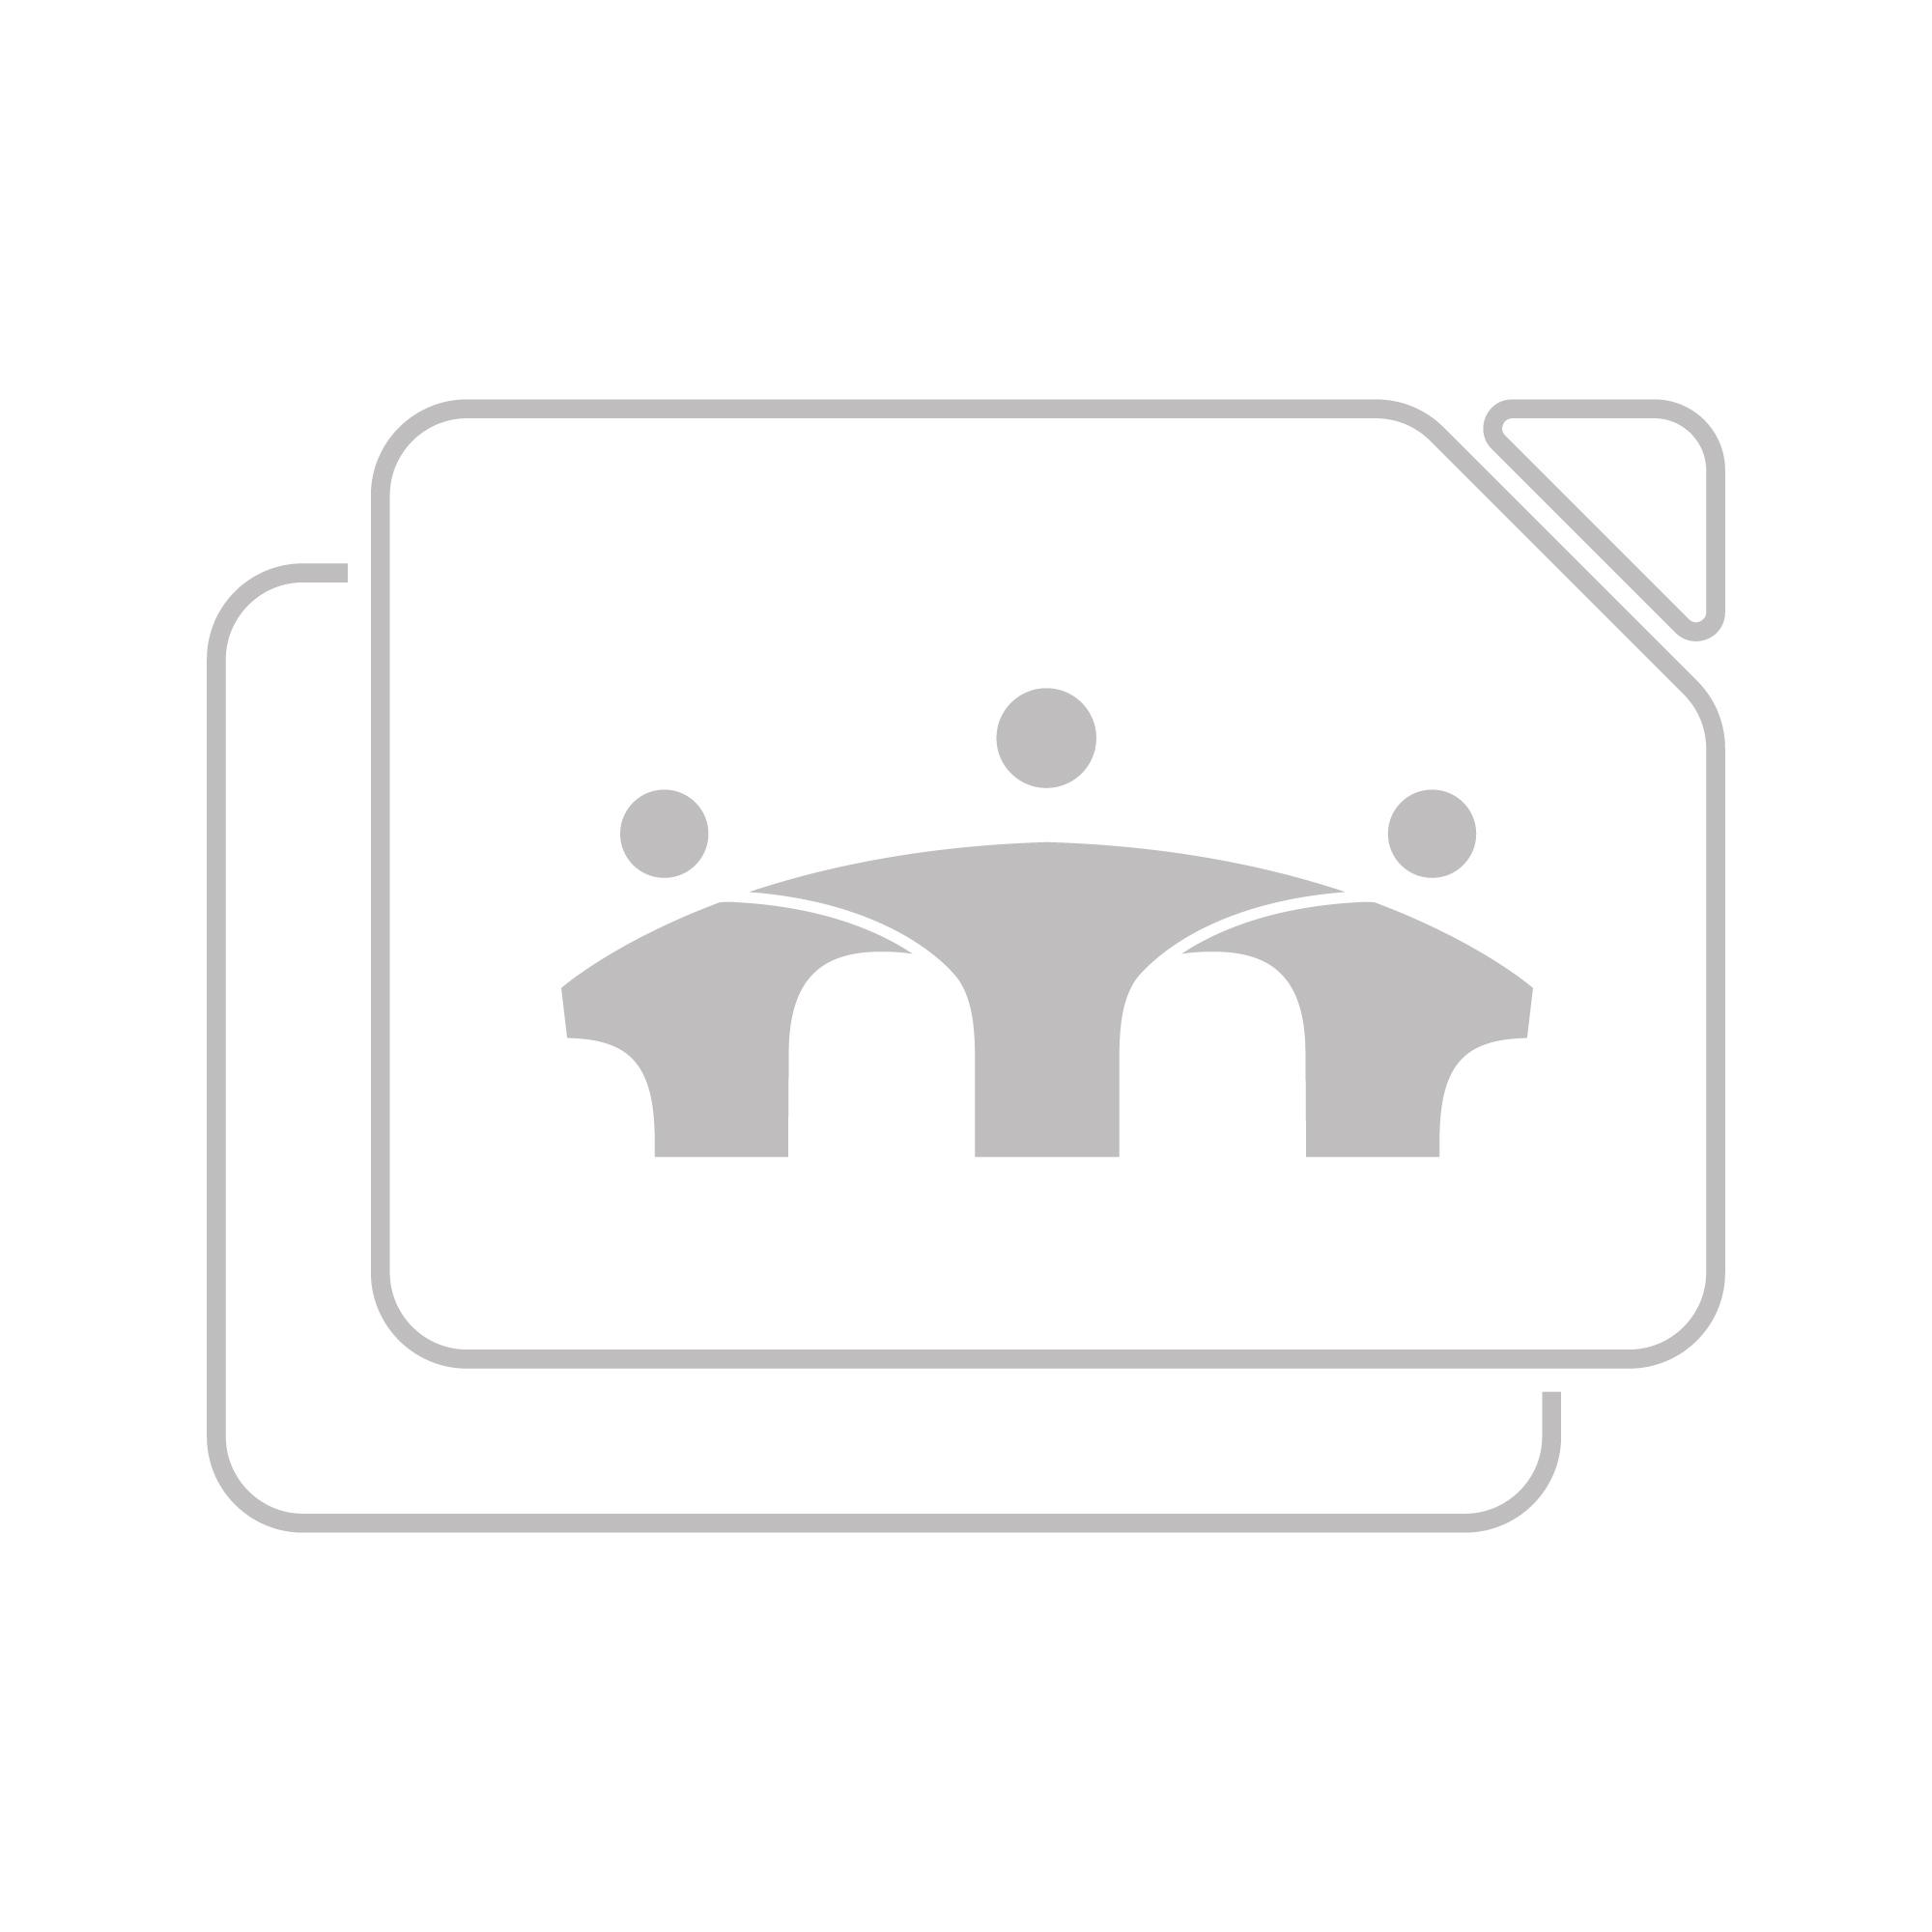 AMD Ryzen 5 PRO 5650G - 4.4GHz (Tray)